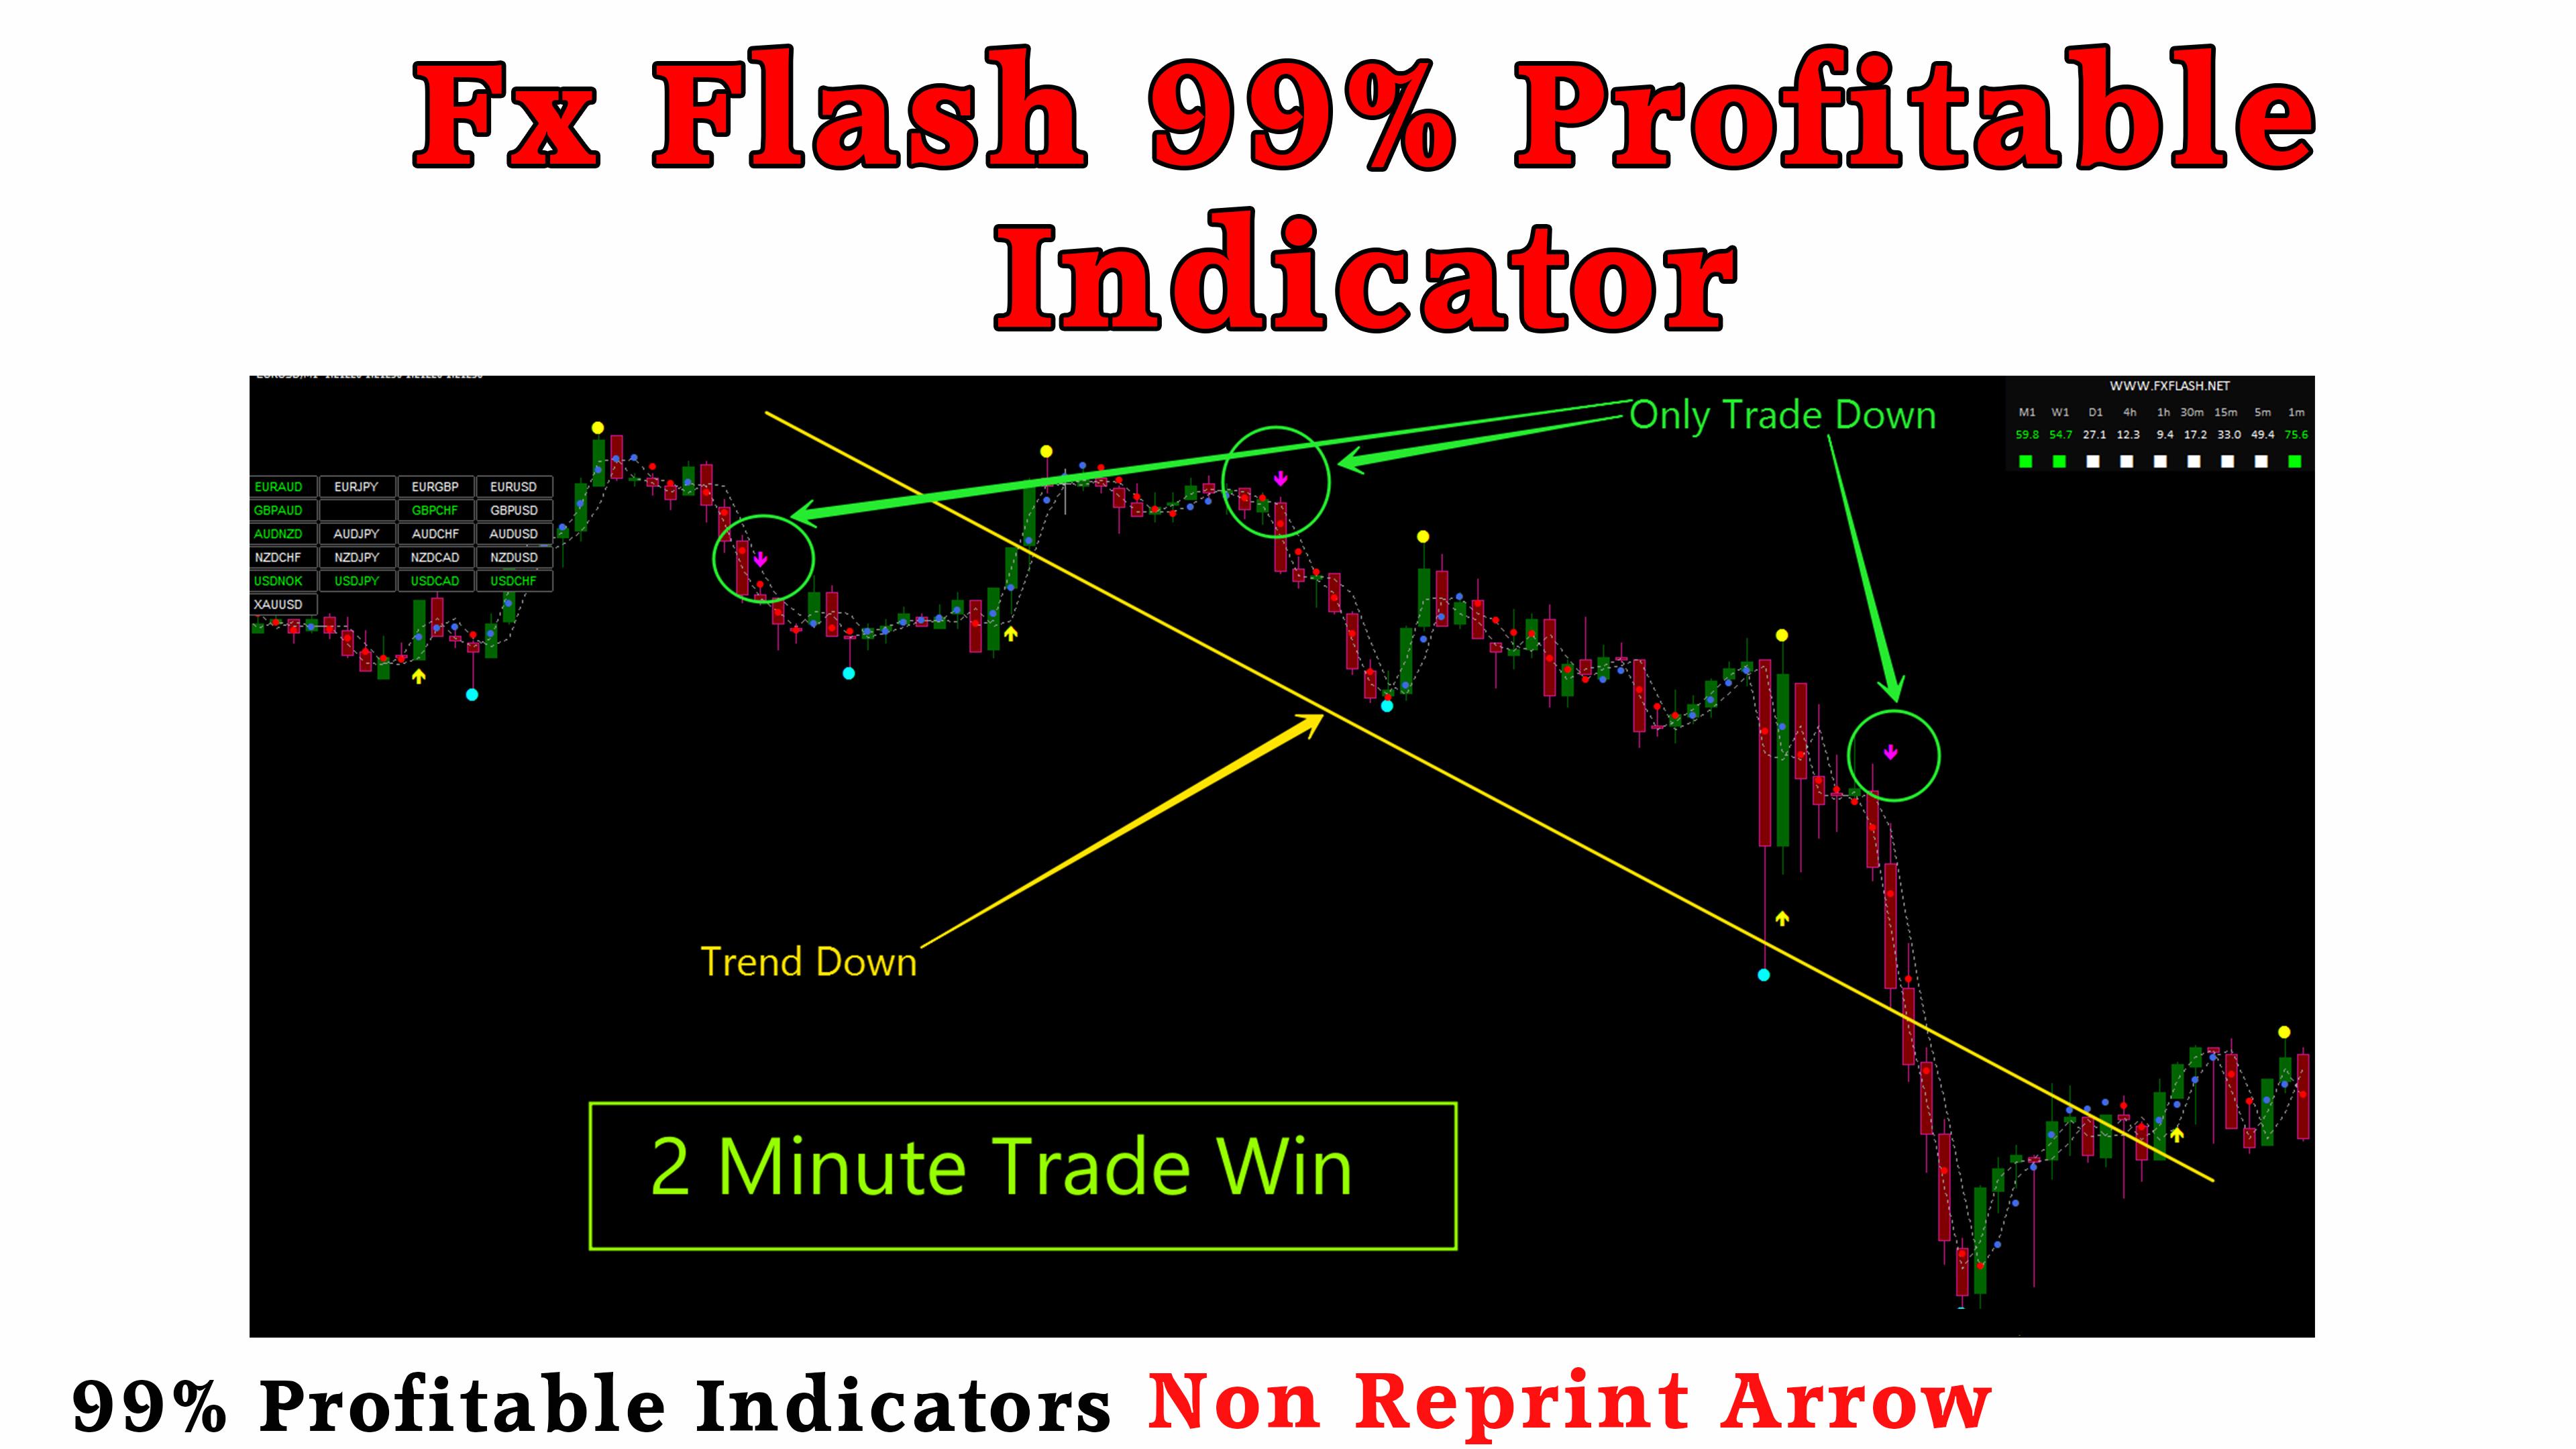 Fx Flash Uniq 2021 MT4 Indicator | 2 Minute Trading On IQ Option| 99% Profitable